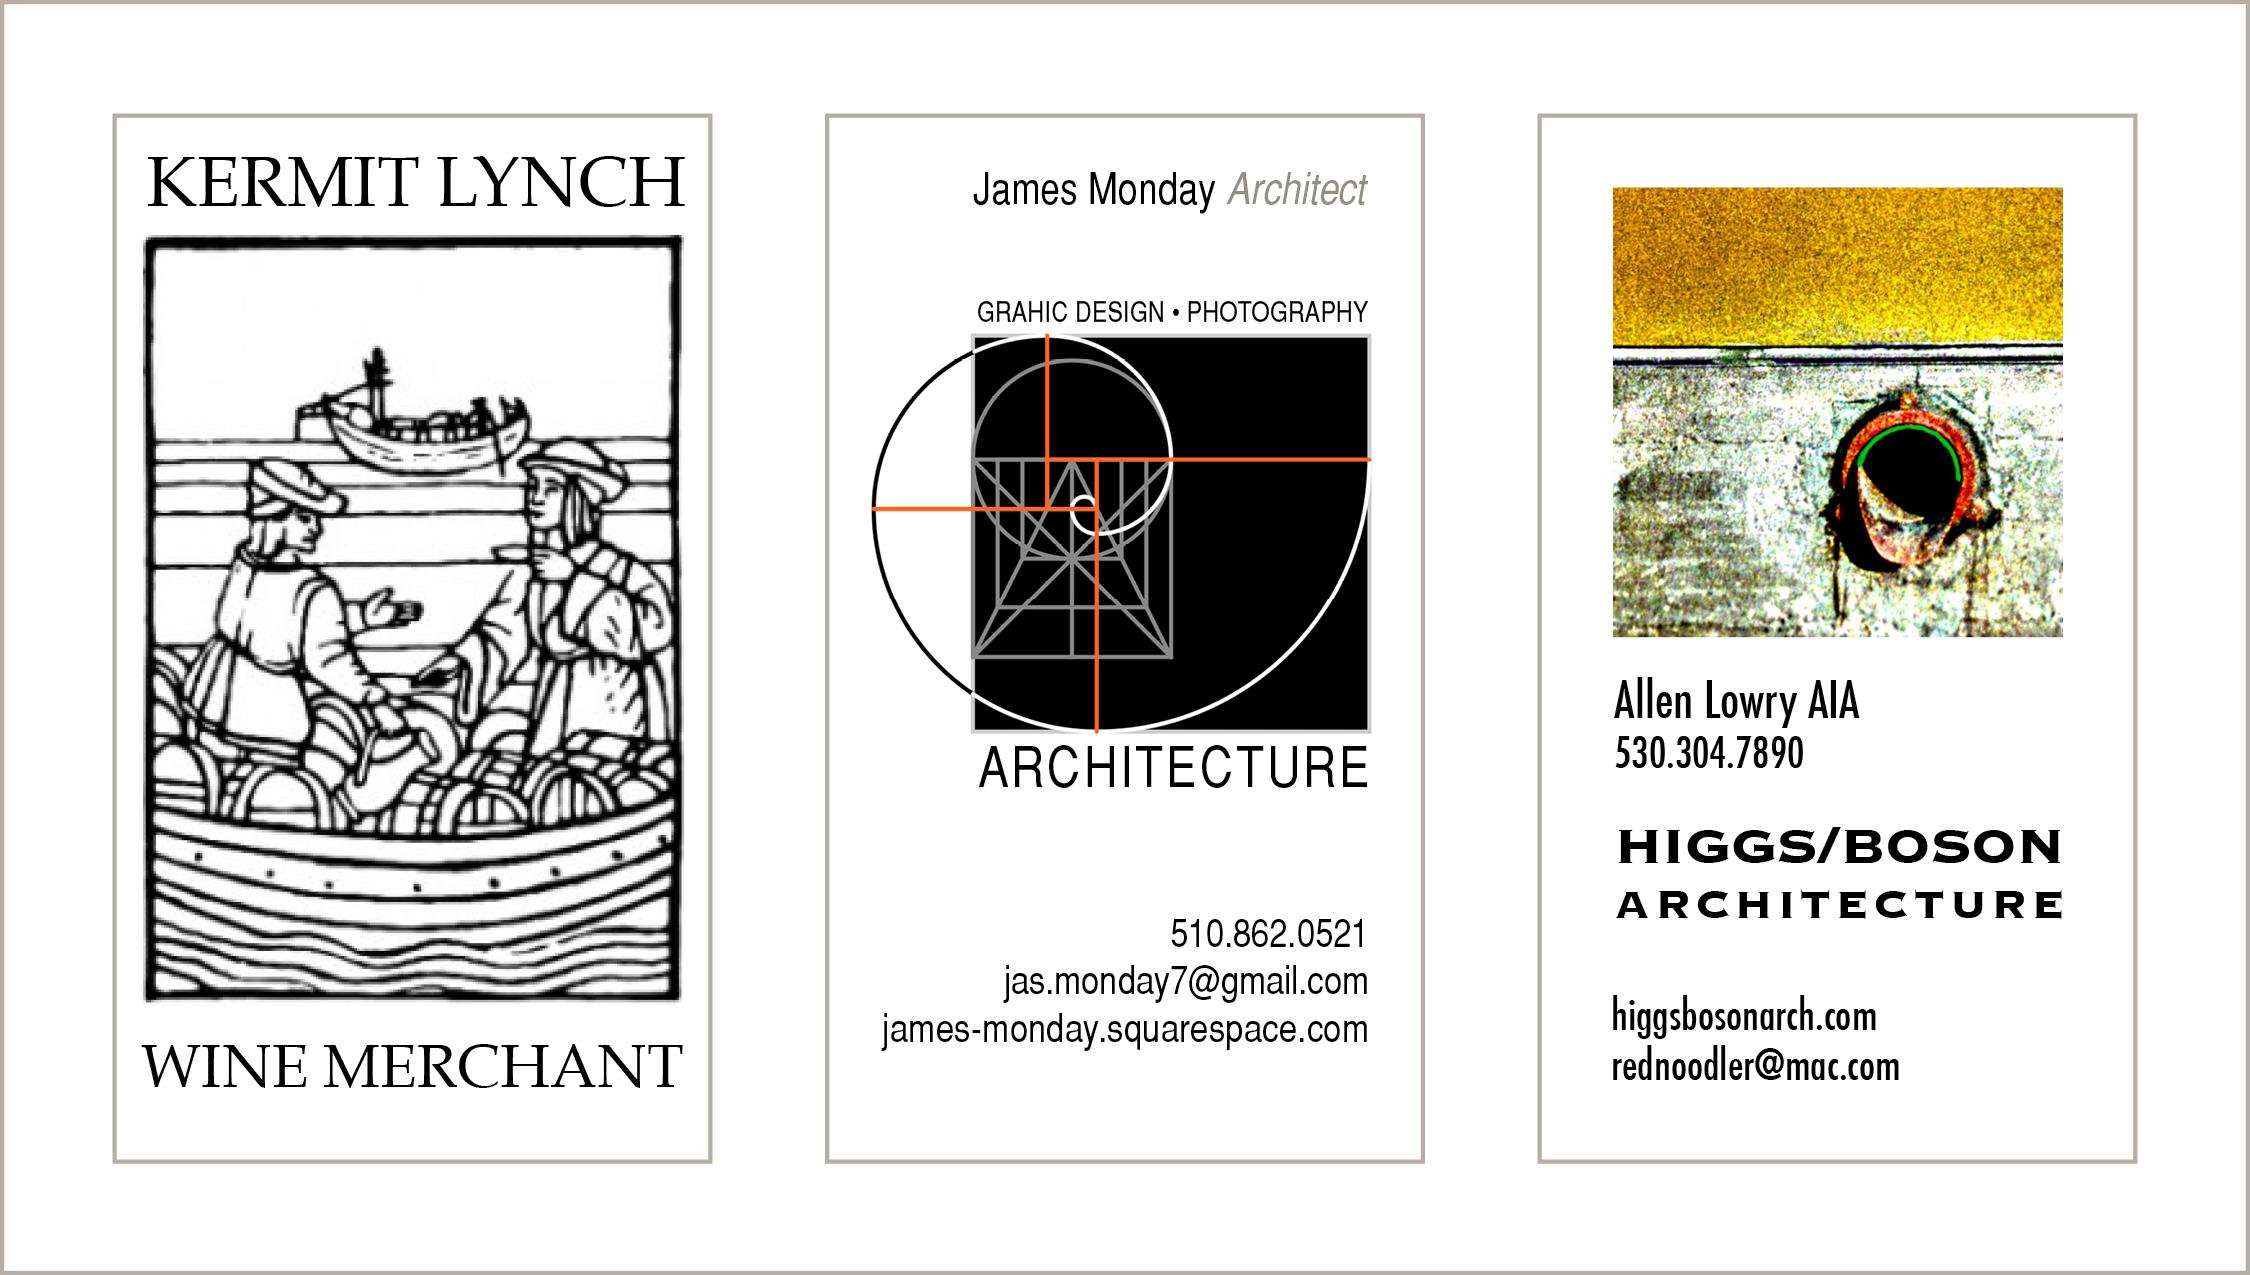 Business Cards   Kermit Lynch, Wine Merchant : James Monday, Architect : Higgs/Bosun Architecture